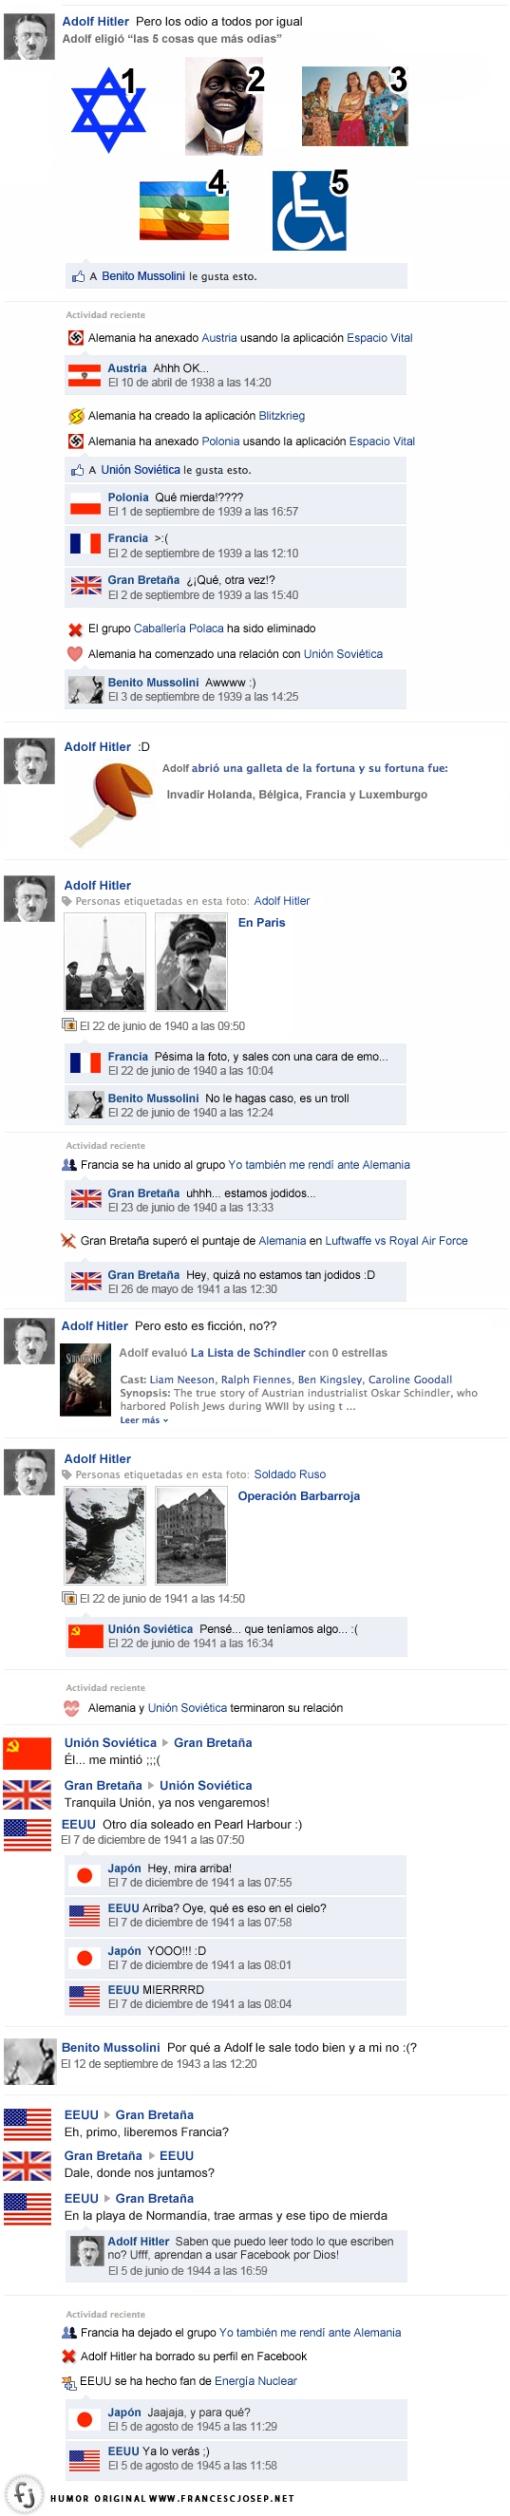 http://periodistapatoso.files.wordpress.com/2009/09/vineta-segunda-guerra-mundial.jpg?w=510&h=2516